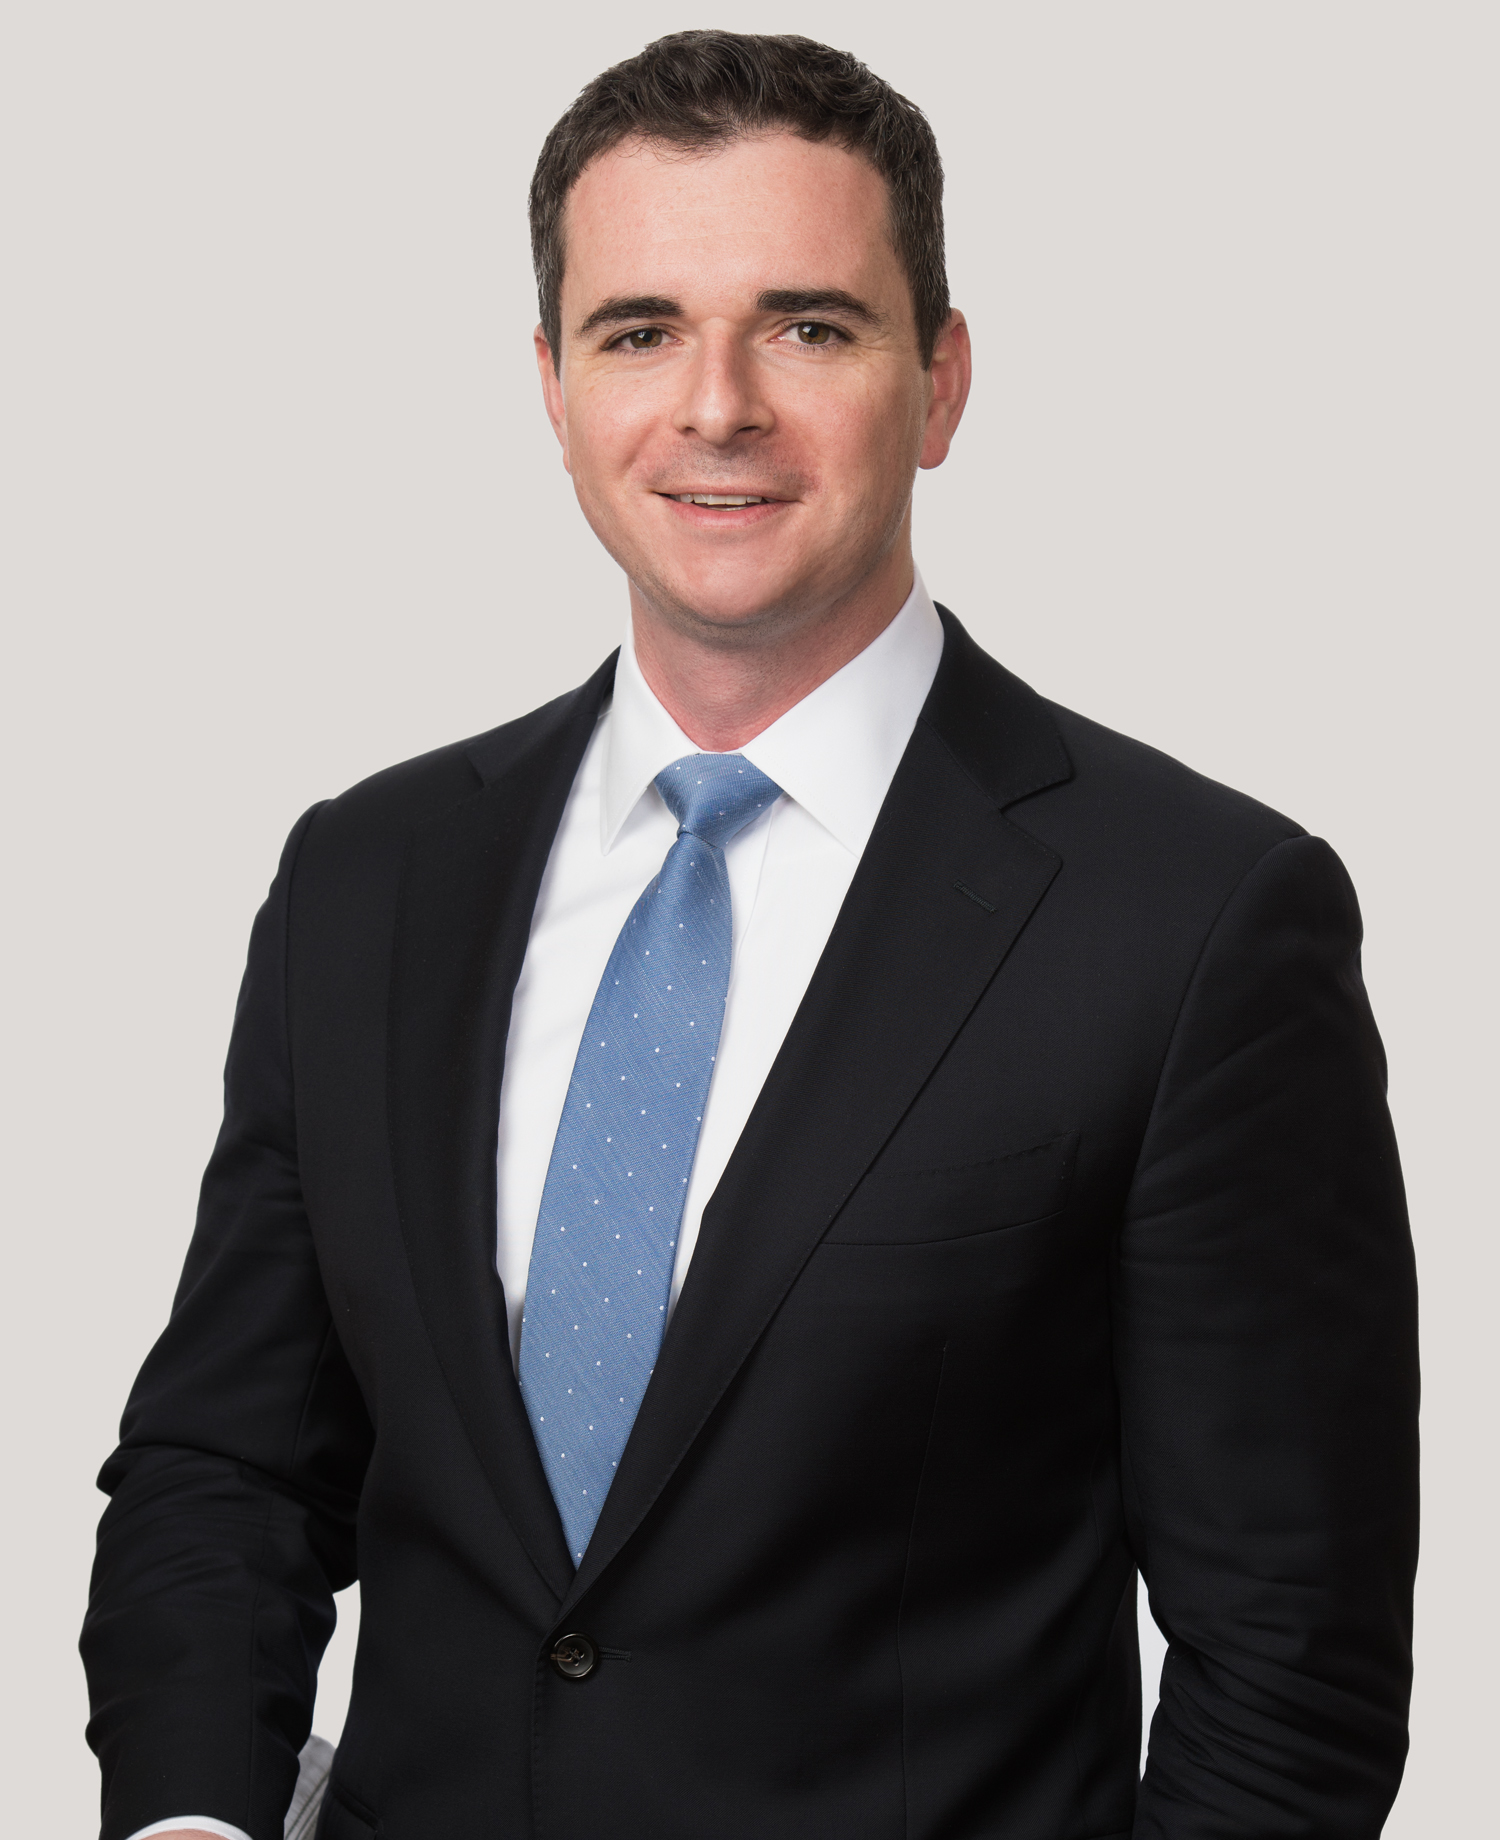 Stephen M. LeBlanc